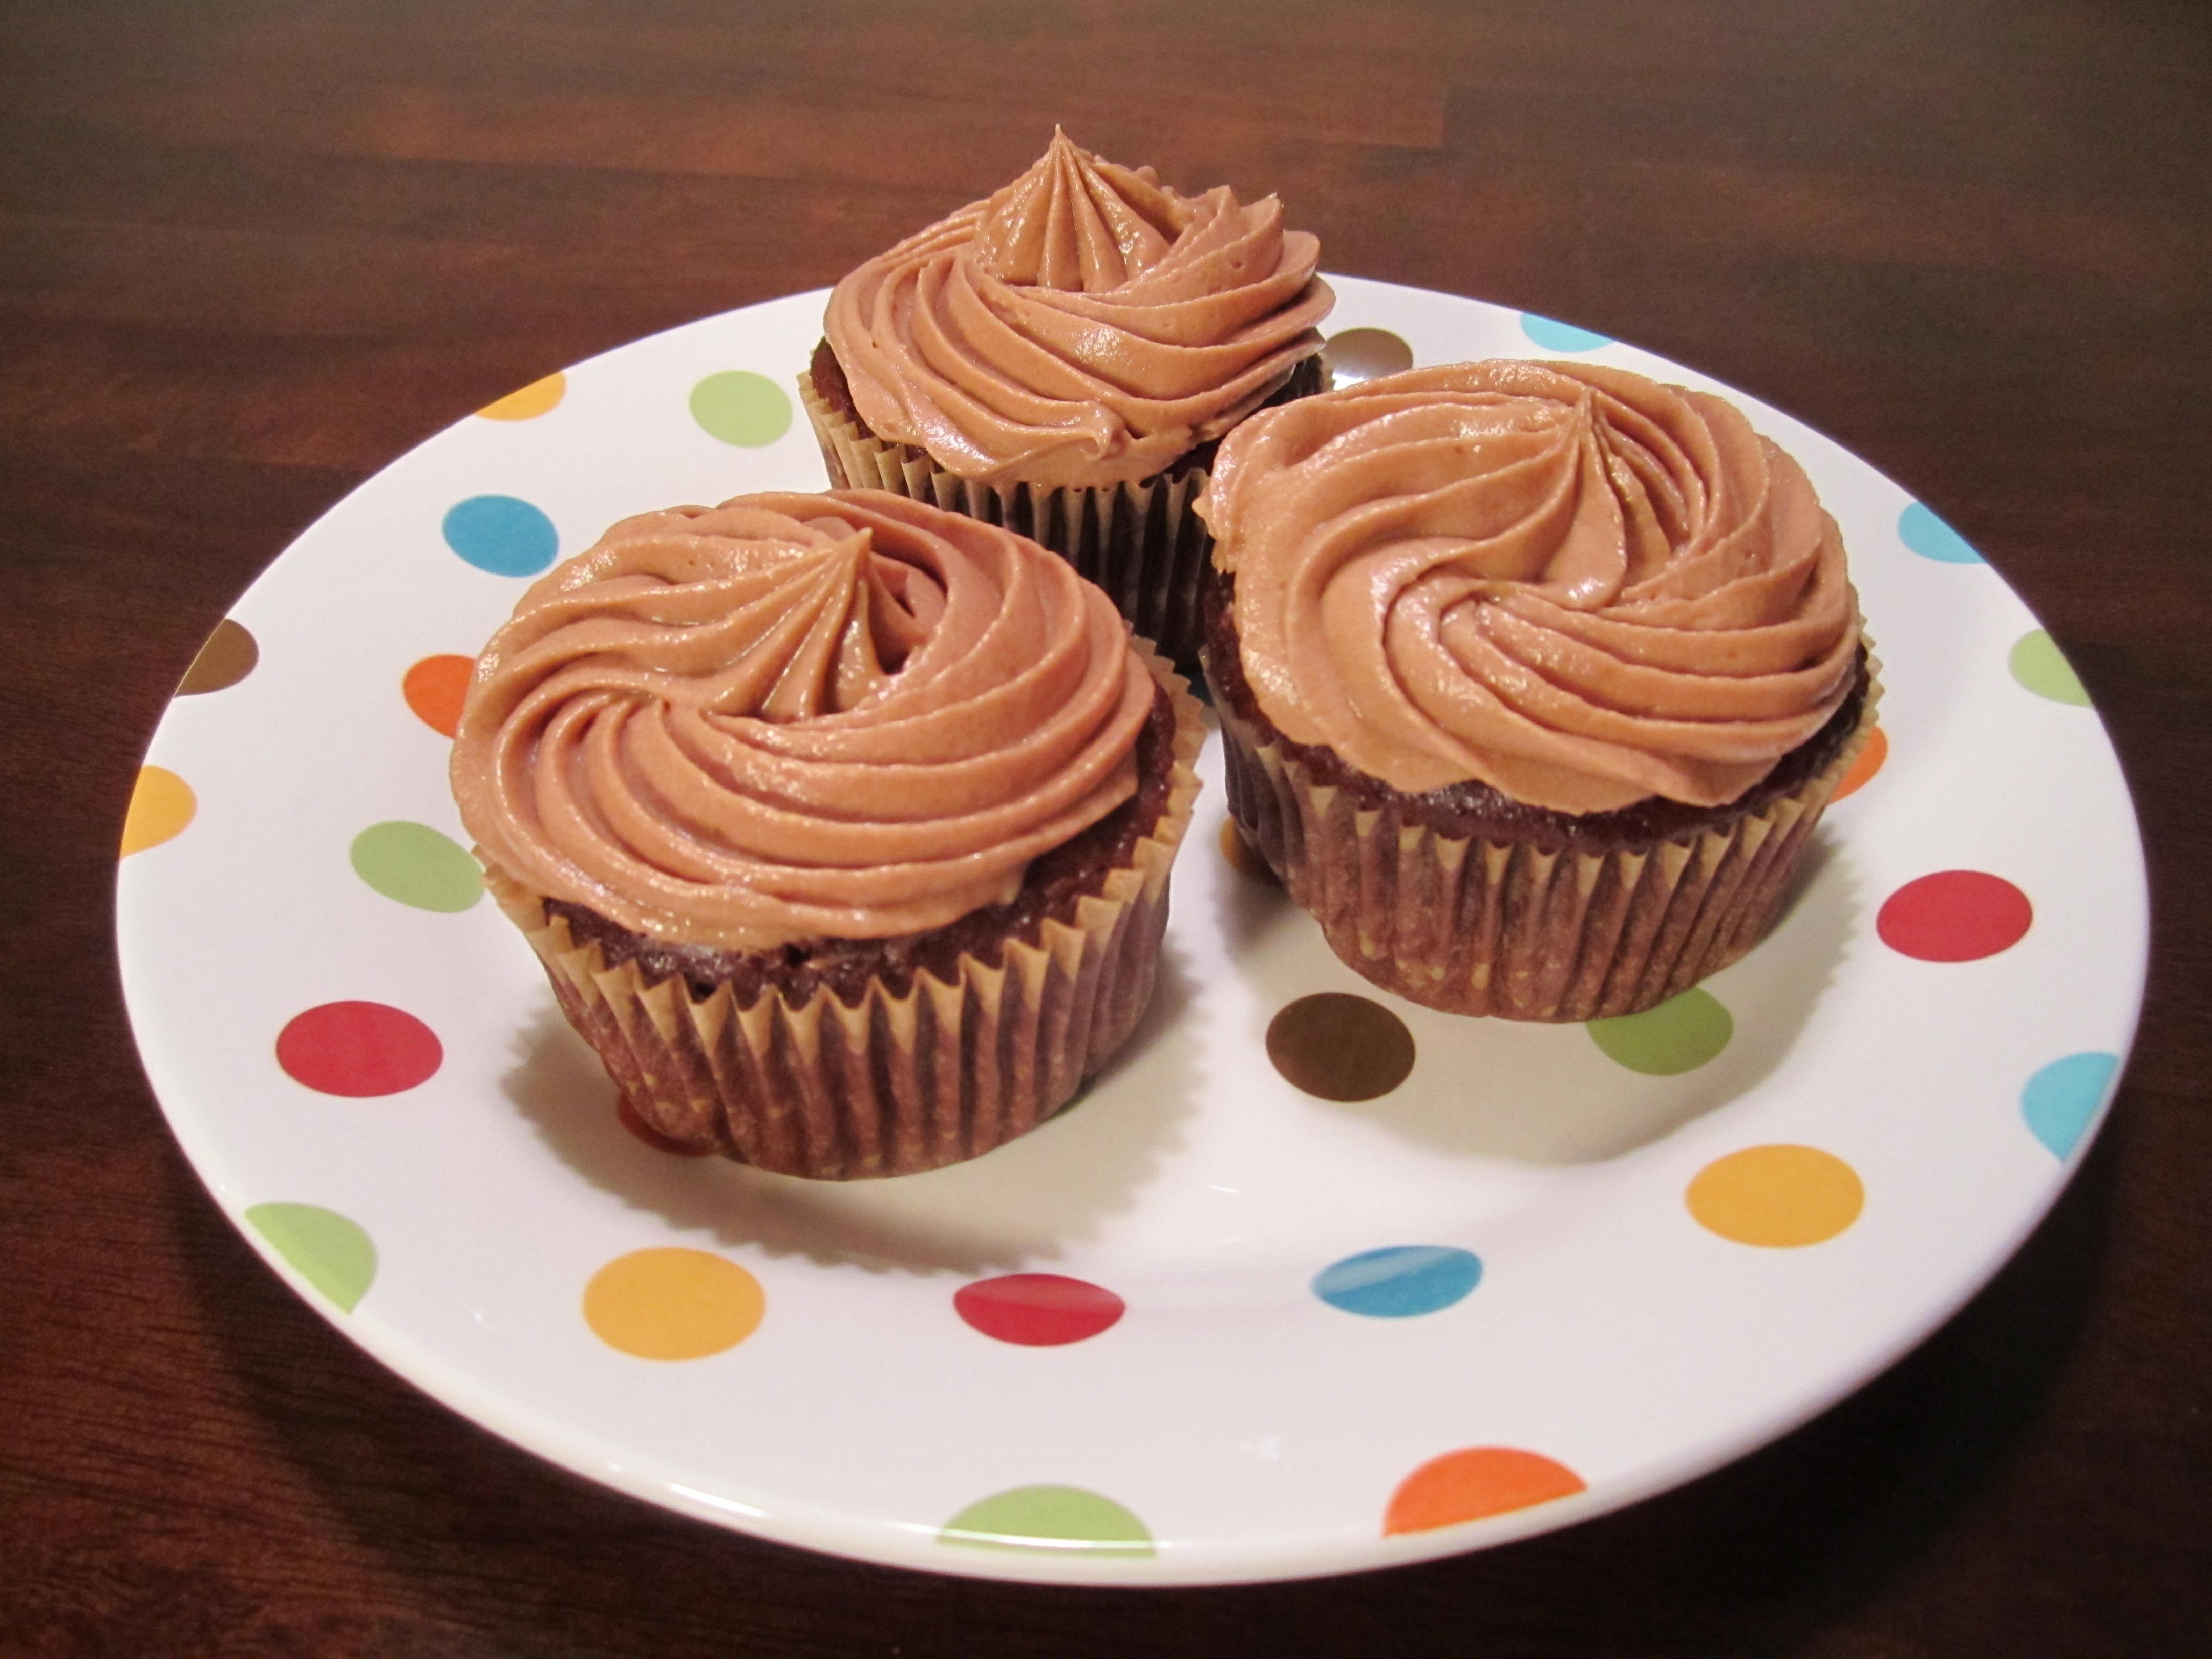 Triple Chocolate Cupcakes with Chocolate Cream Cheese ... Chocolate Cupcake With Cream Cheese Frosting